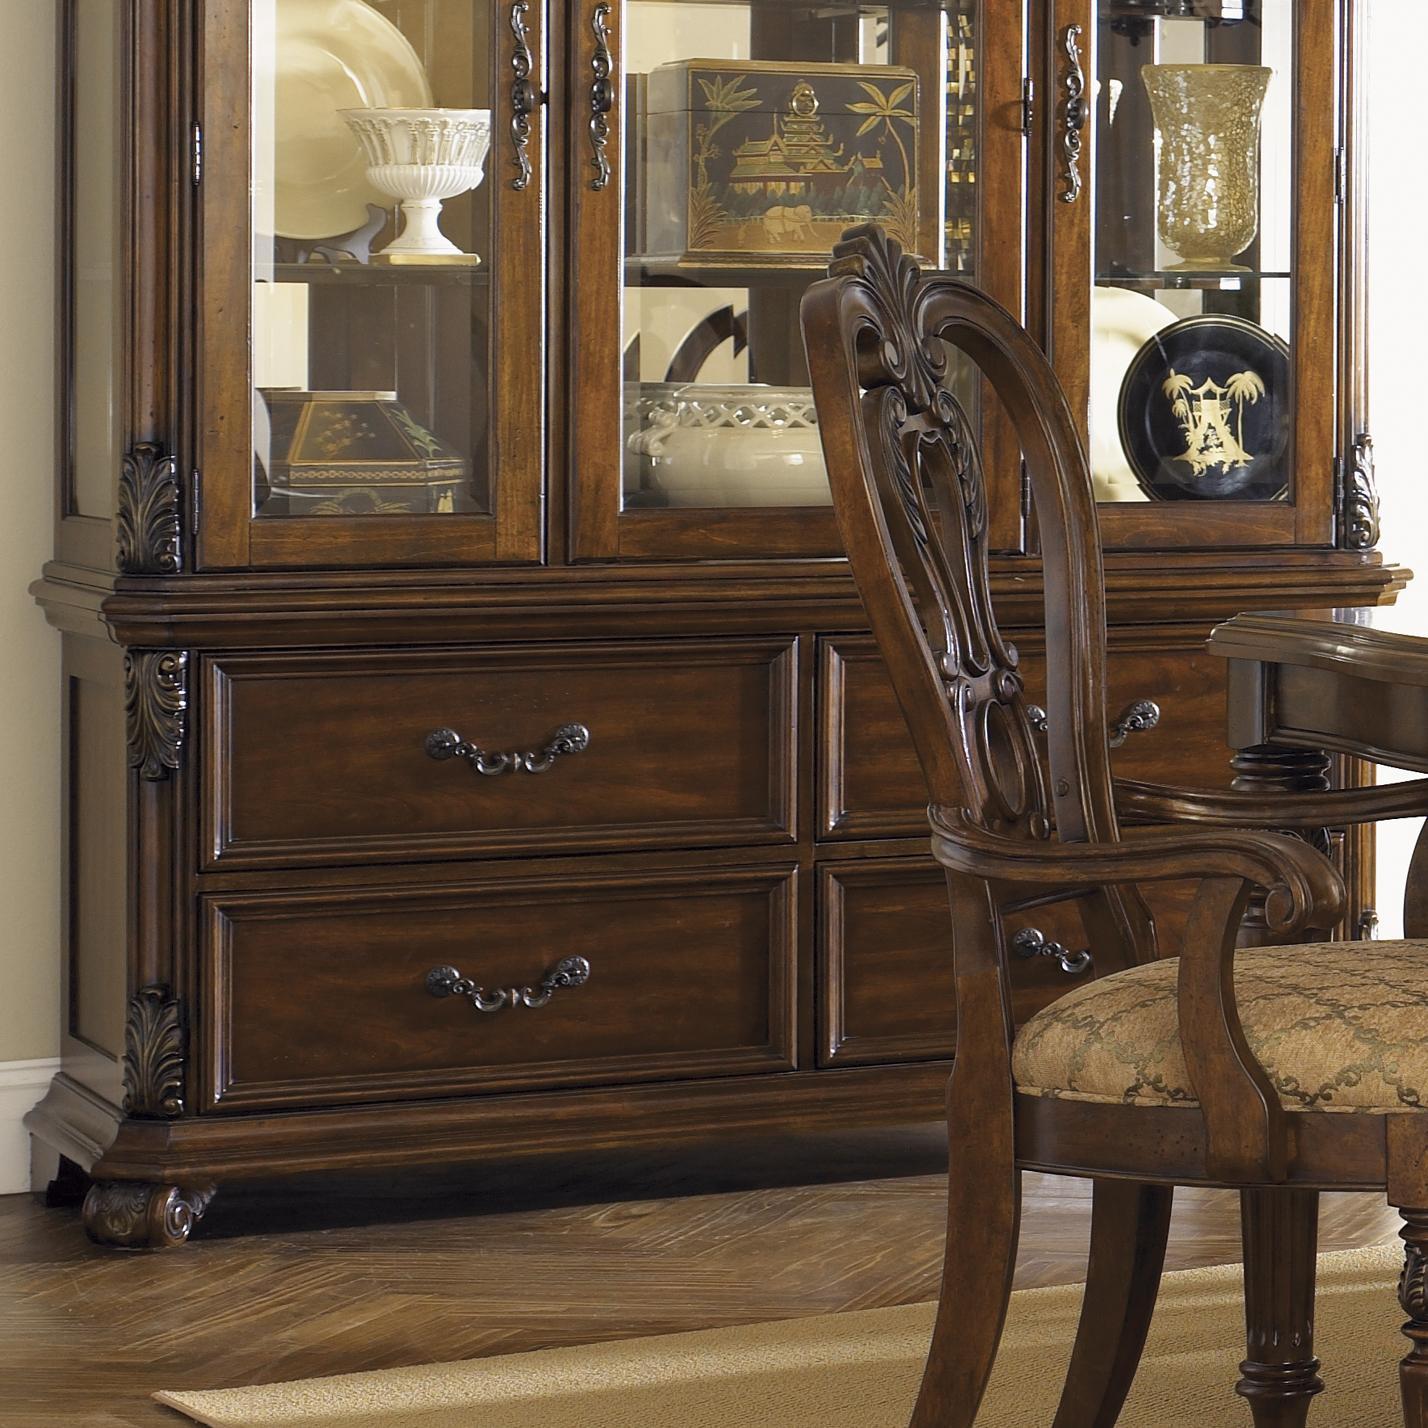 Liberty Furniture Messina Estates Dining Buffet - Item Number: 737-CB6384